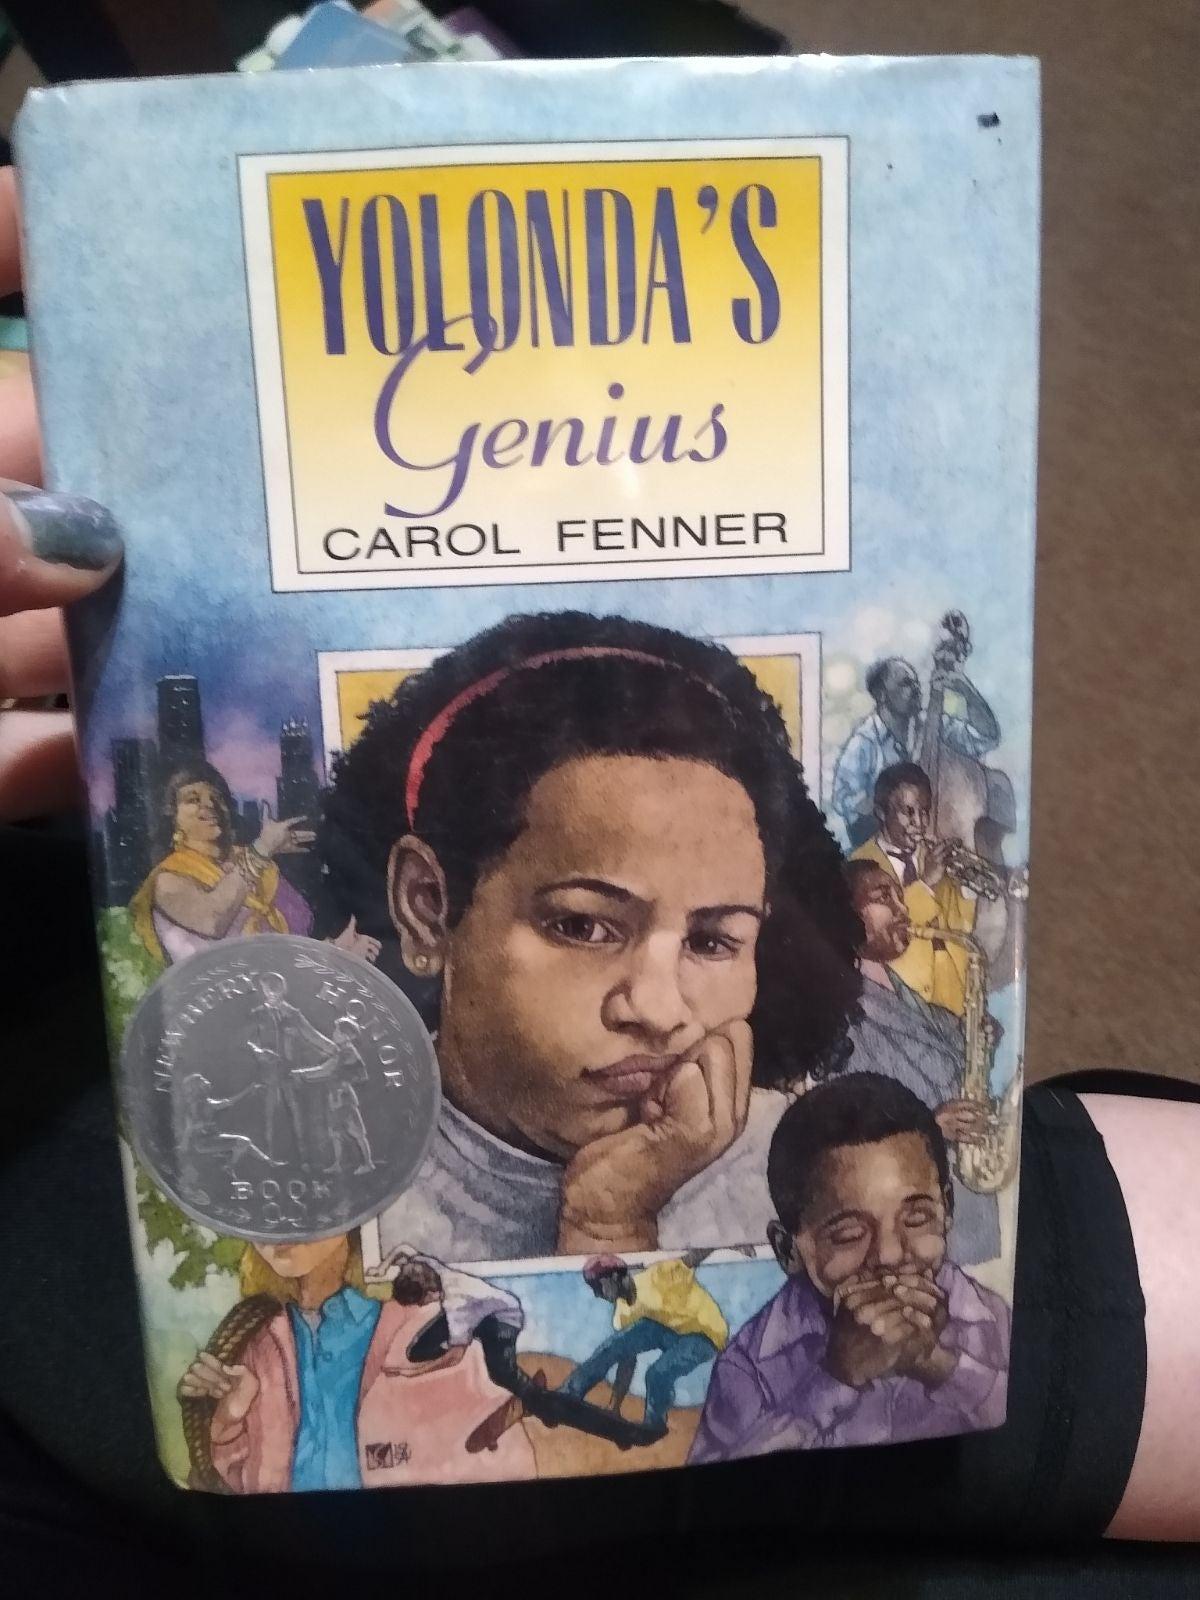 Yolanda's genius first edition